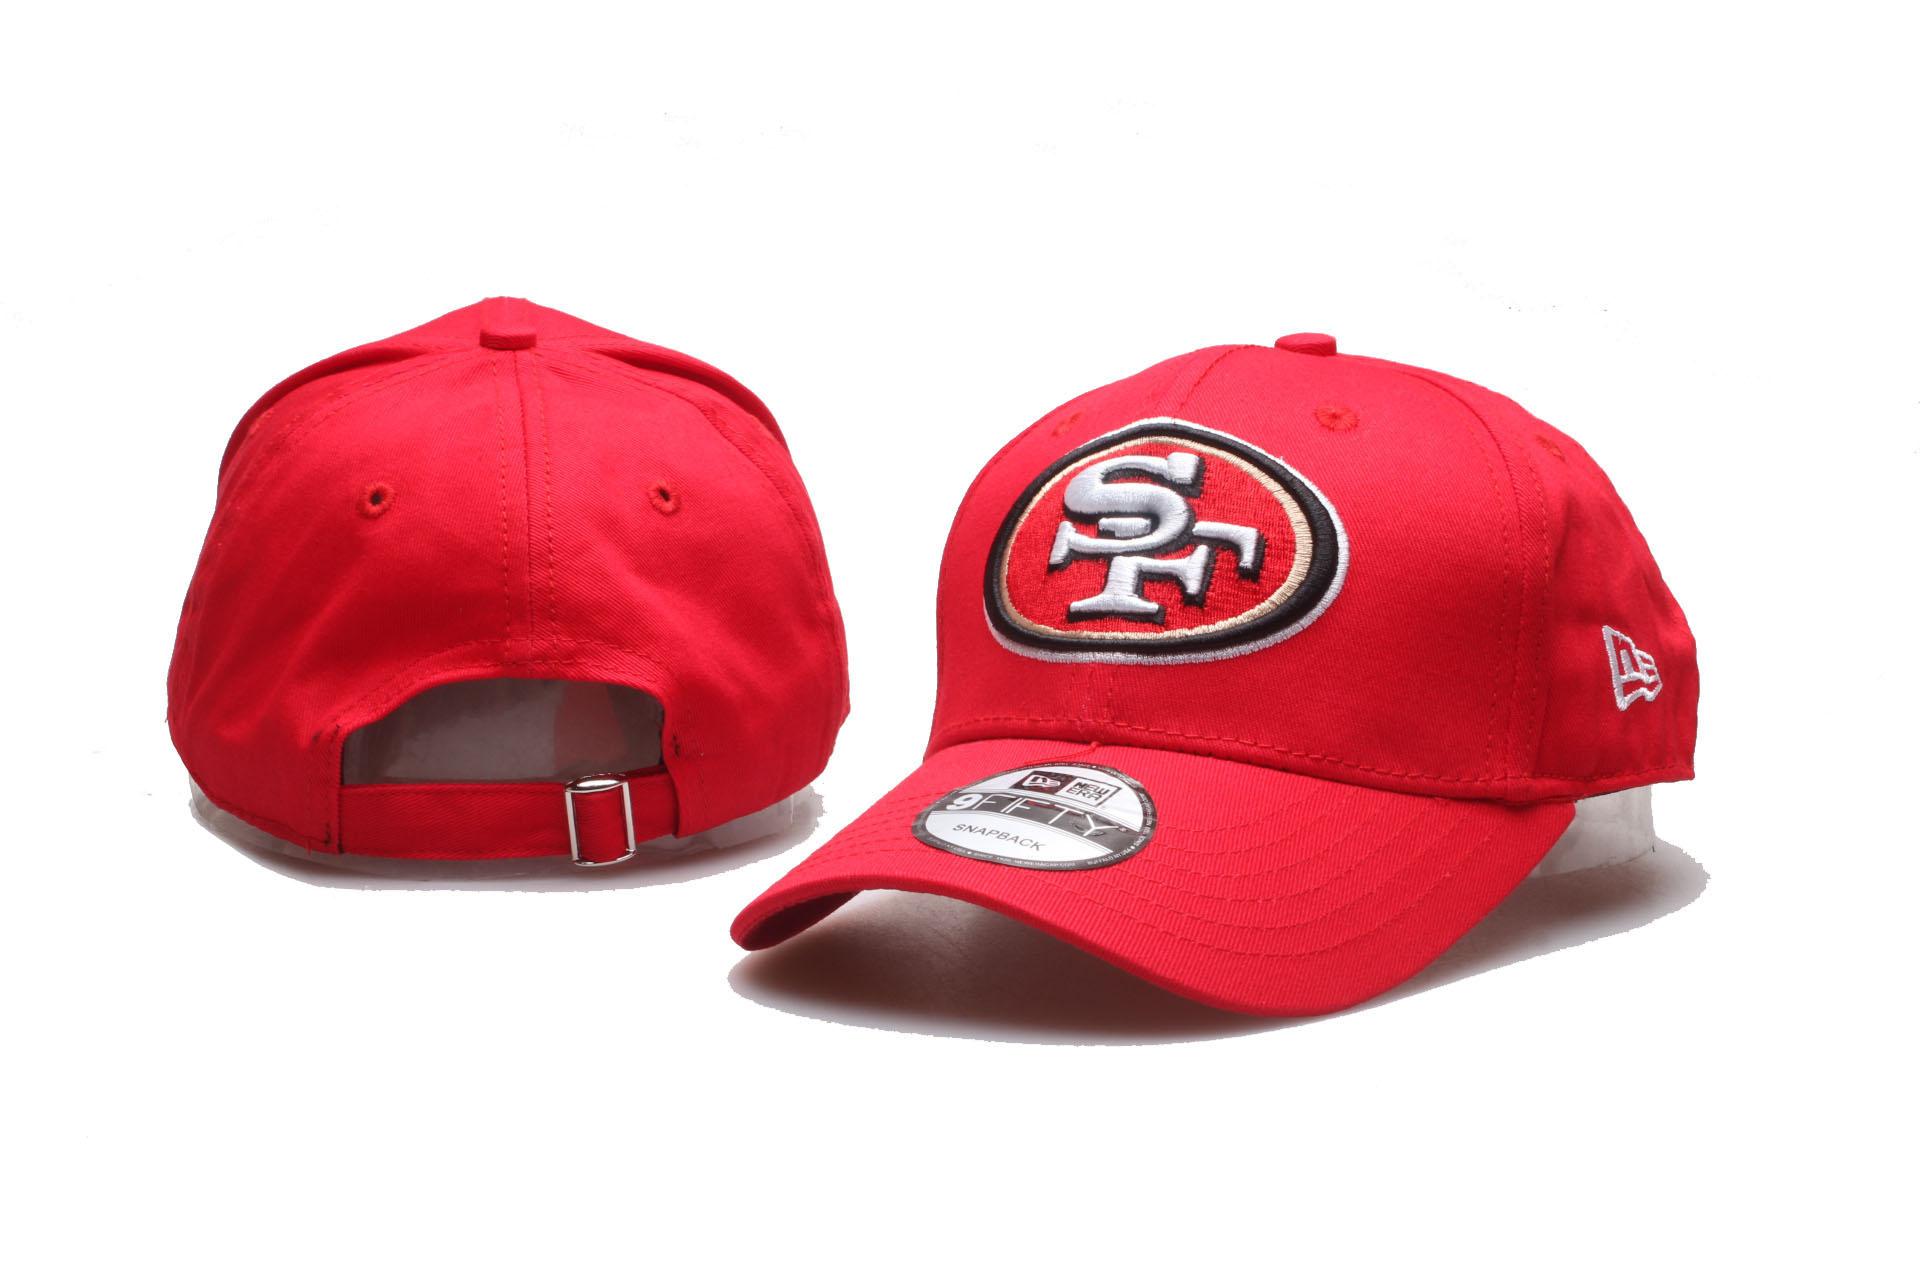 49ers Team Logo Red Peaked Adjustable Hat YP